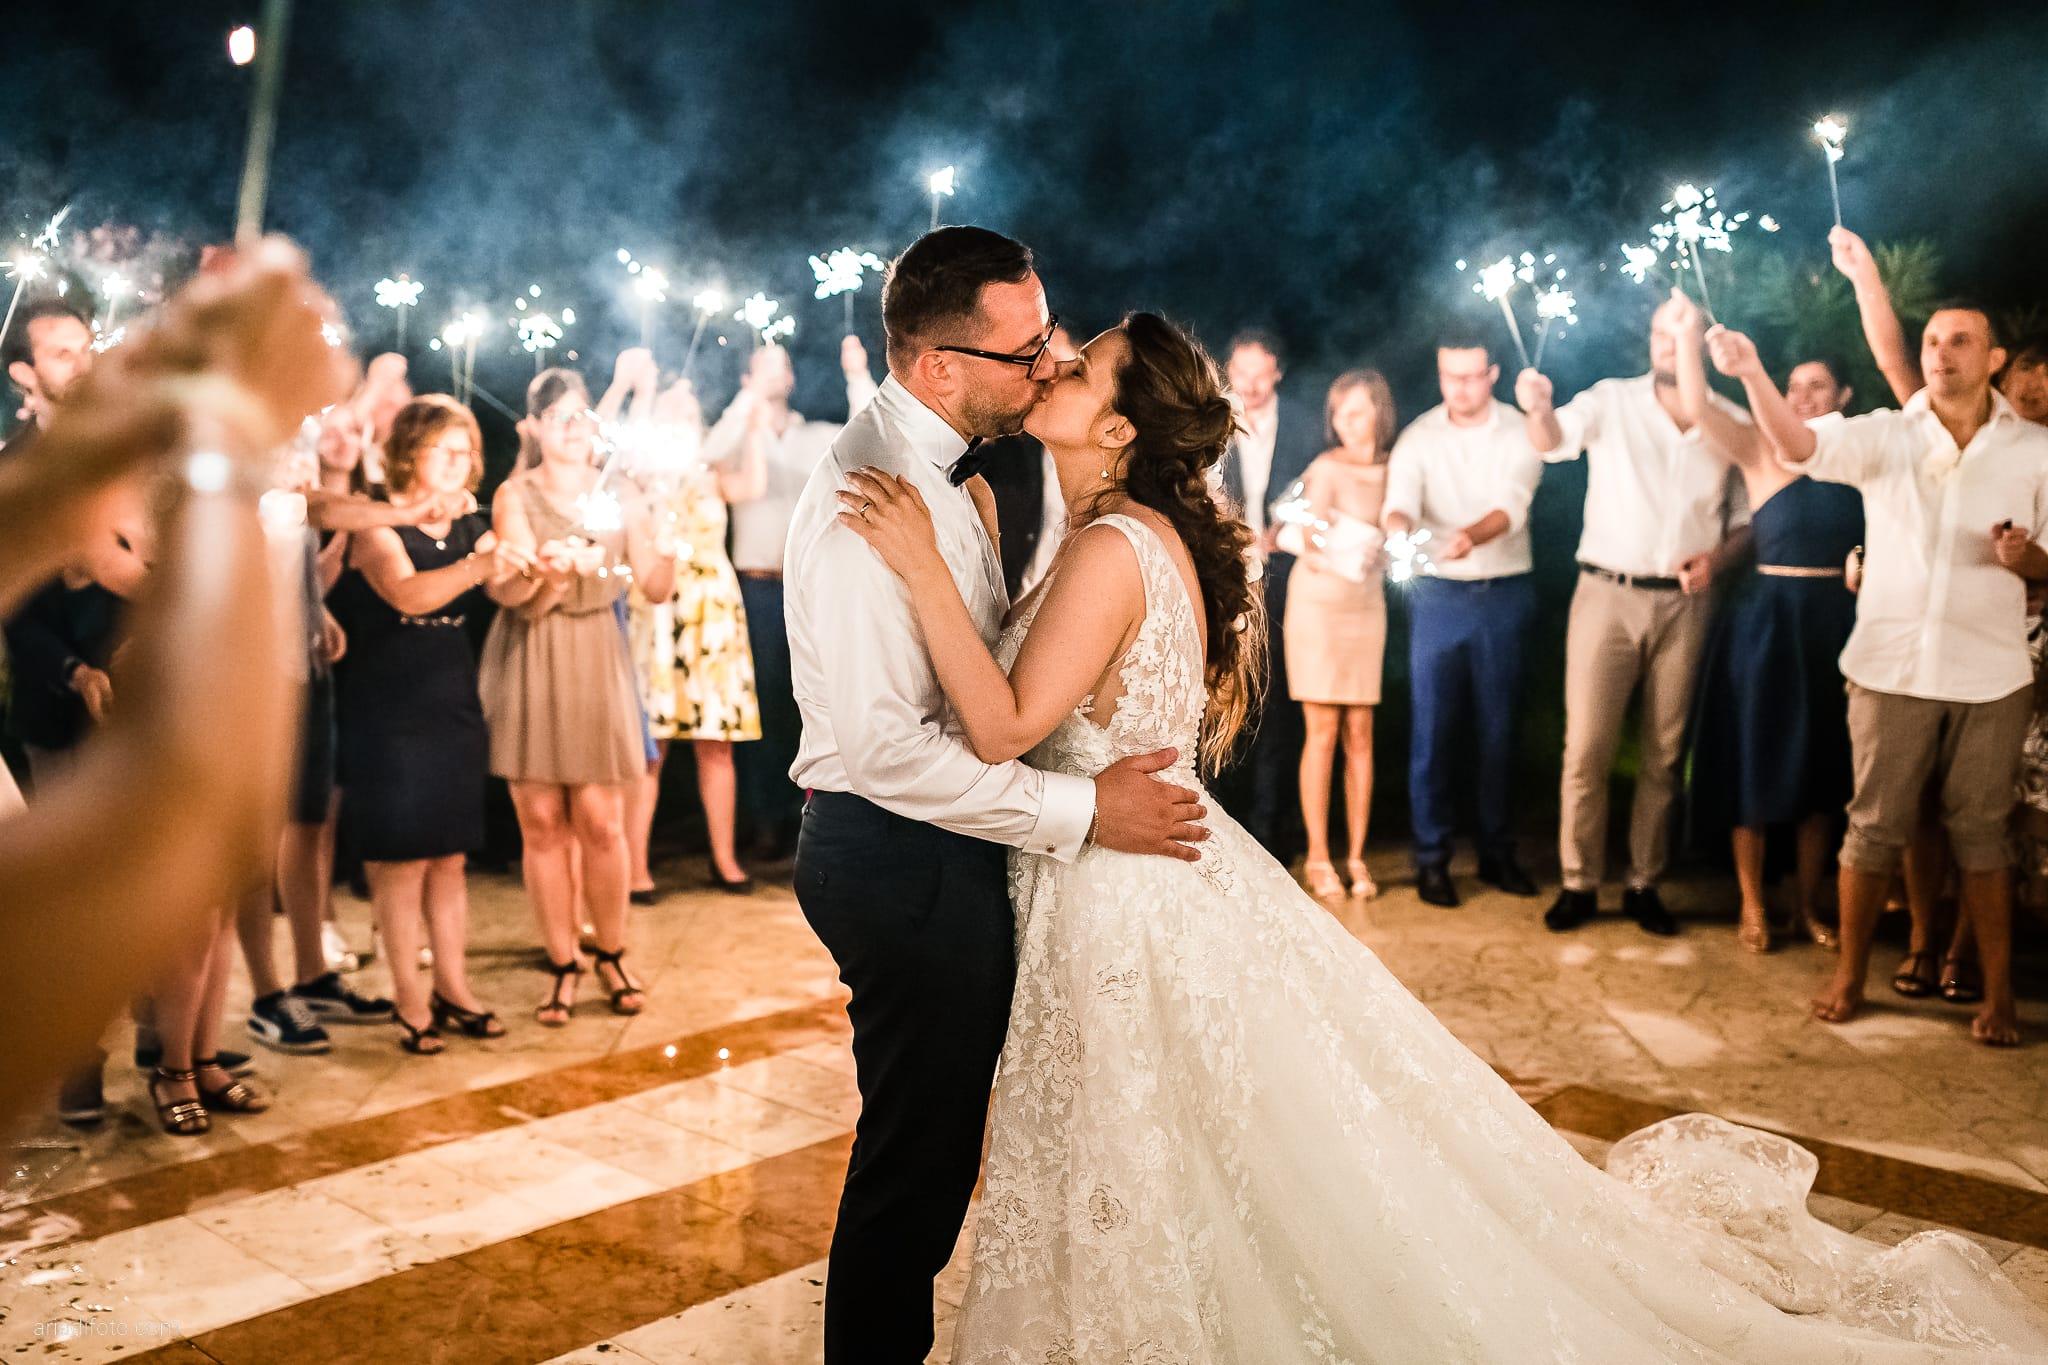 Matrimonio Country Chic Treviso : Country chic wedding foorevent